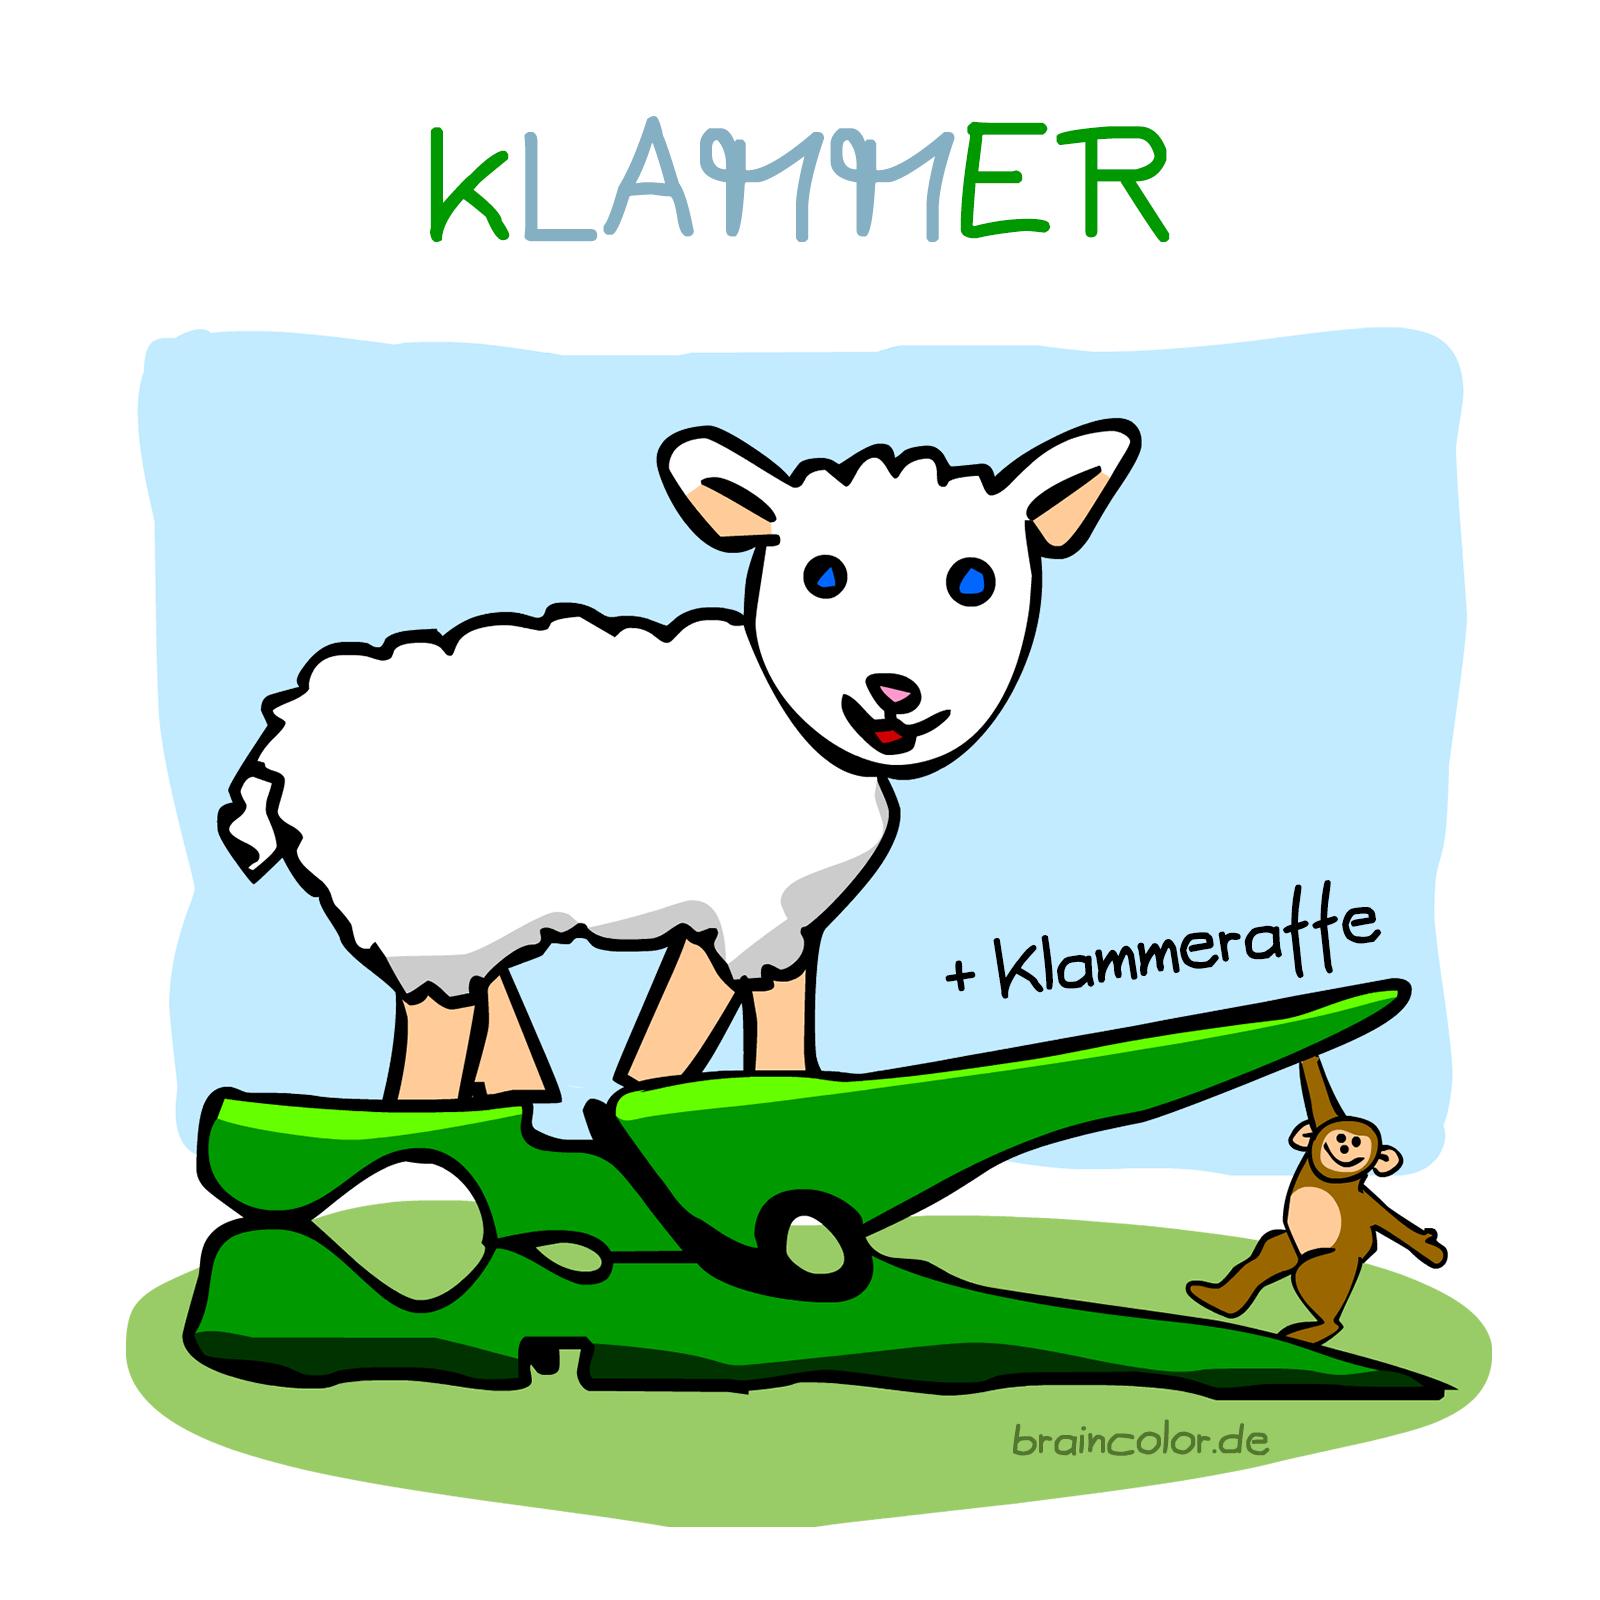 Klammer